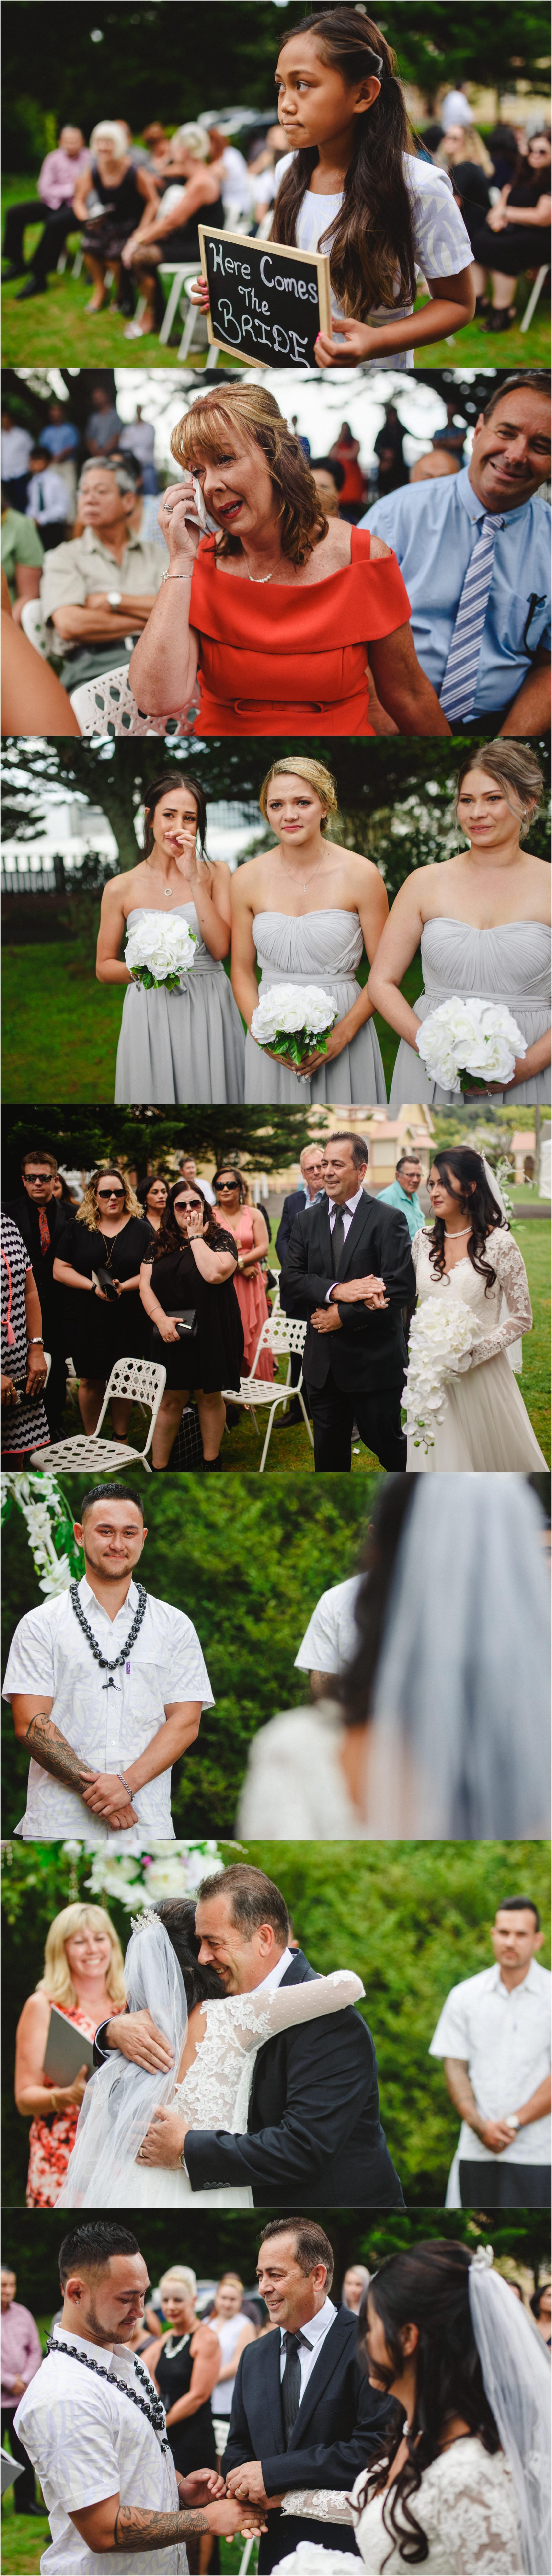 highwic house wedding photos